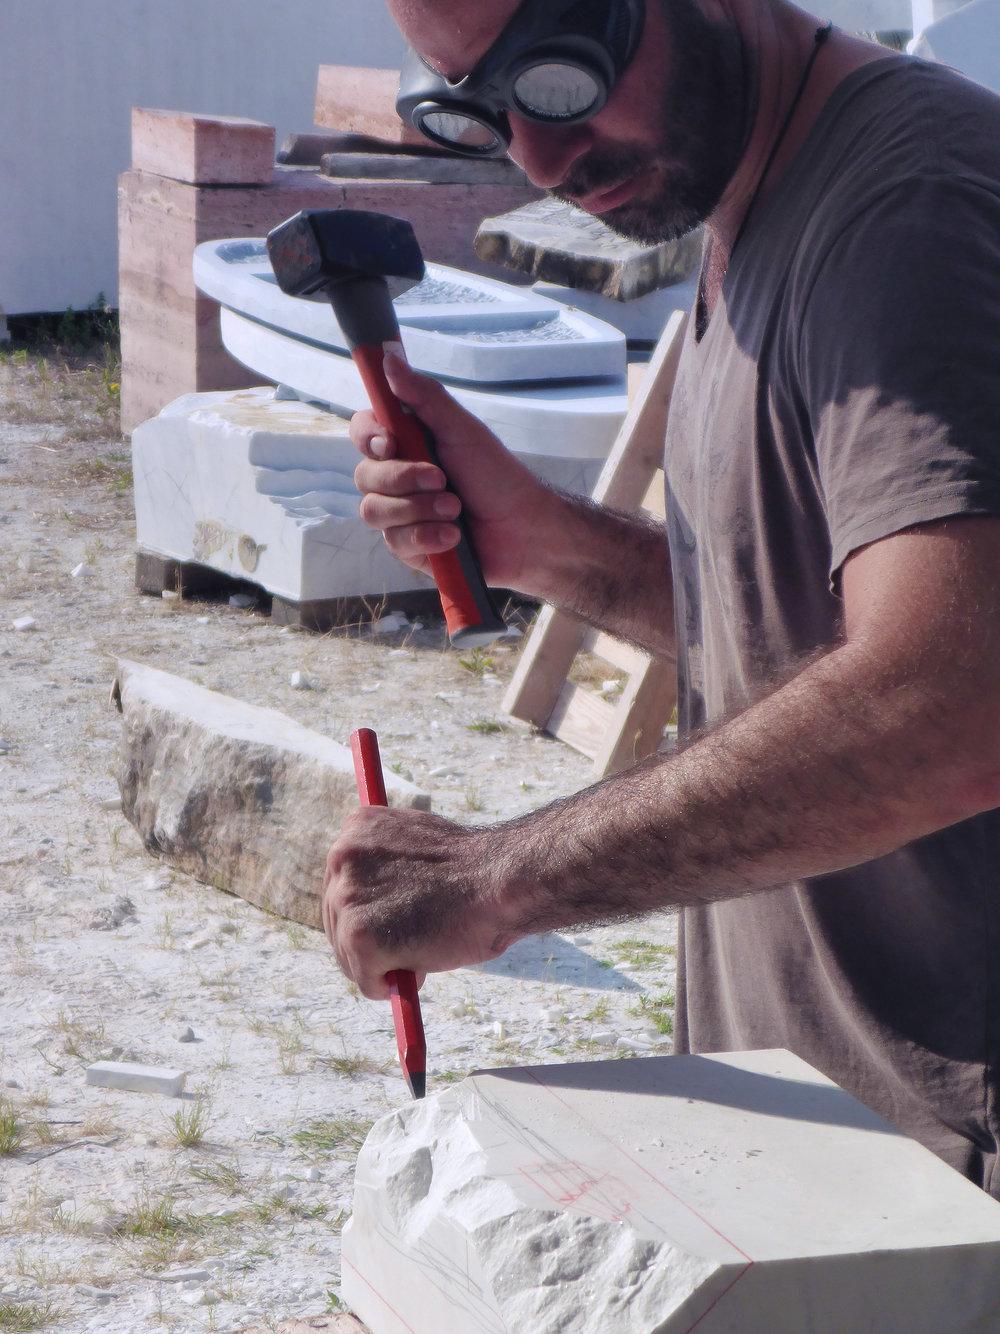 Jorge-Vascano-Carving-Marble.jpg